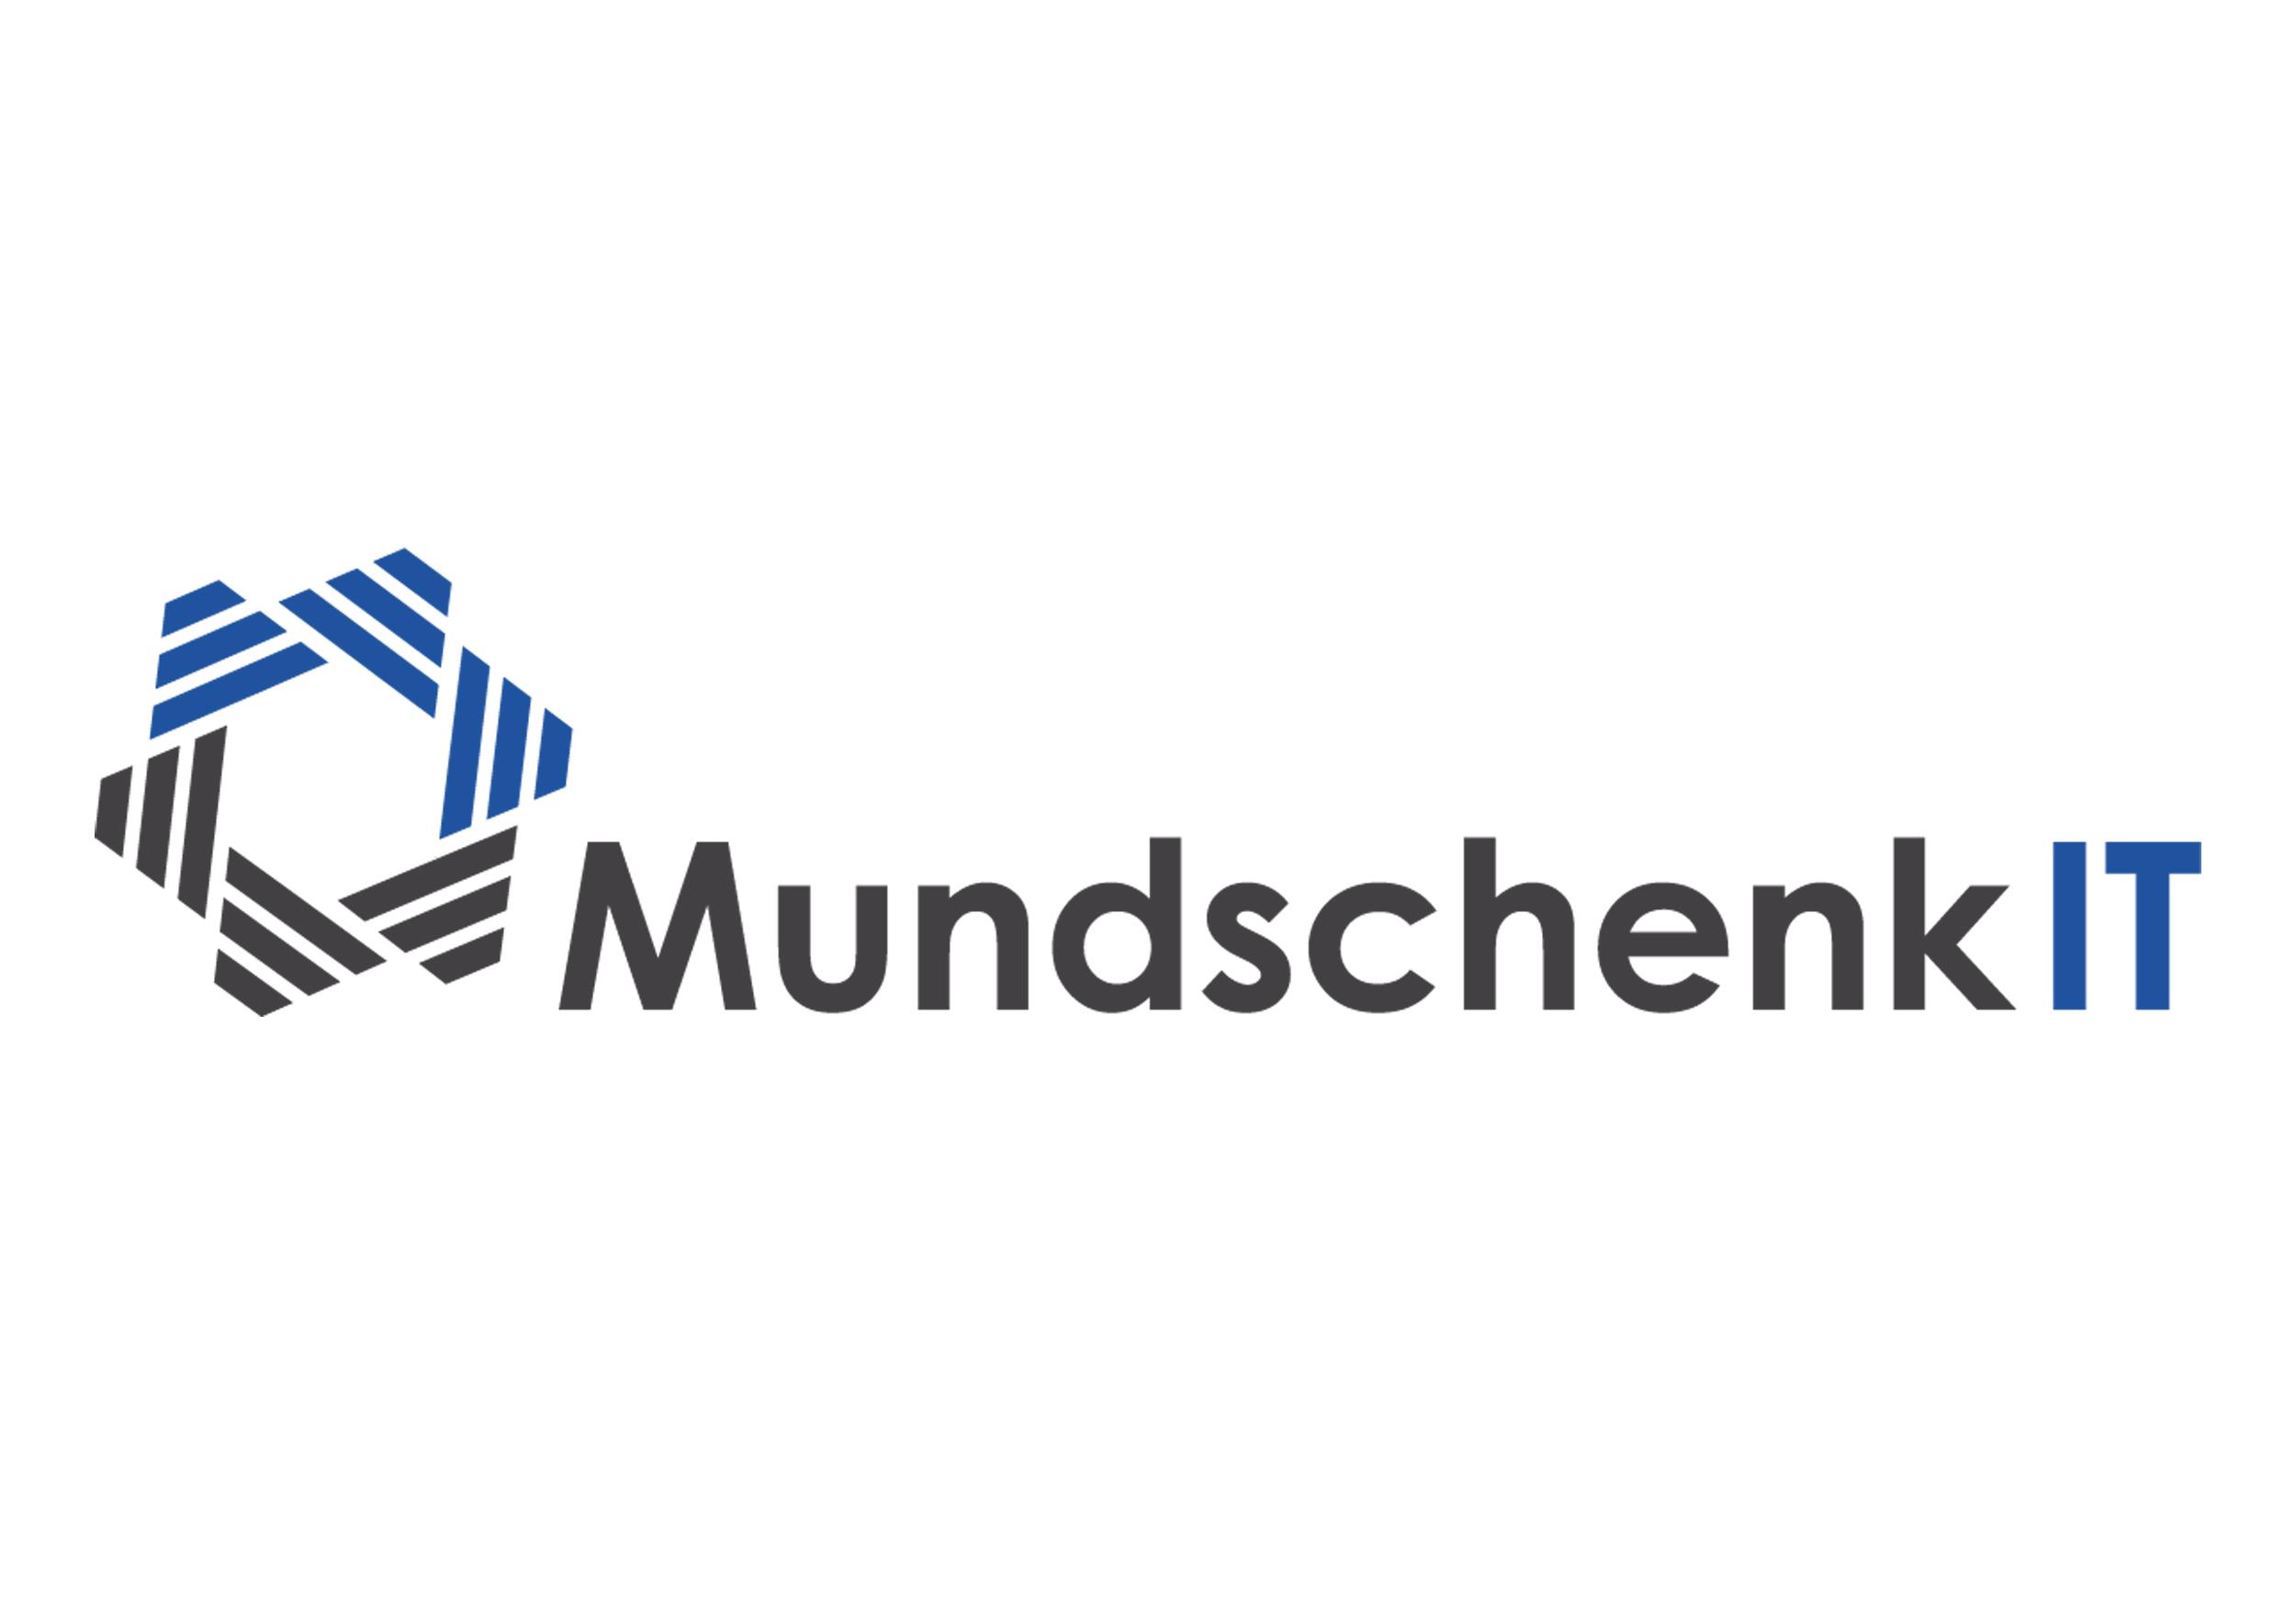 bzb_web_mundschenk_it_logo_2500x1768.jpg